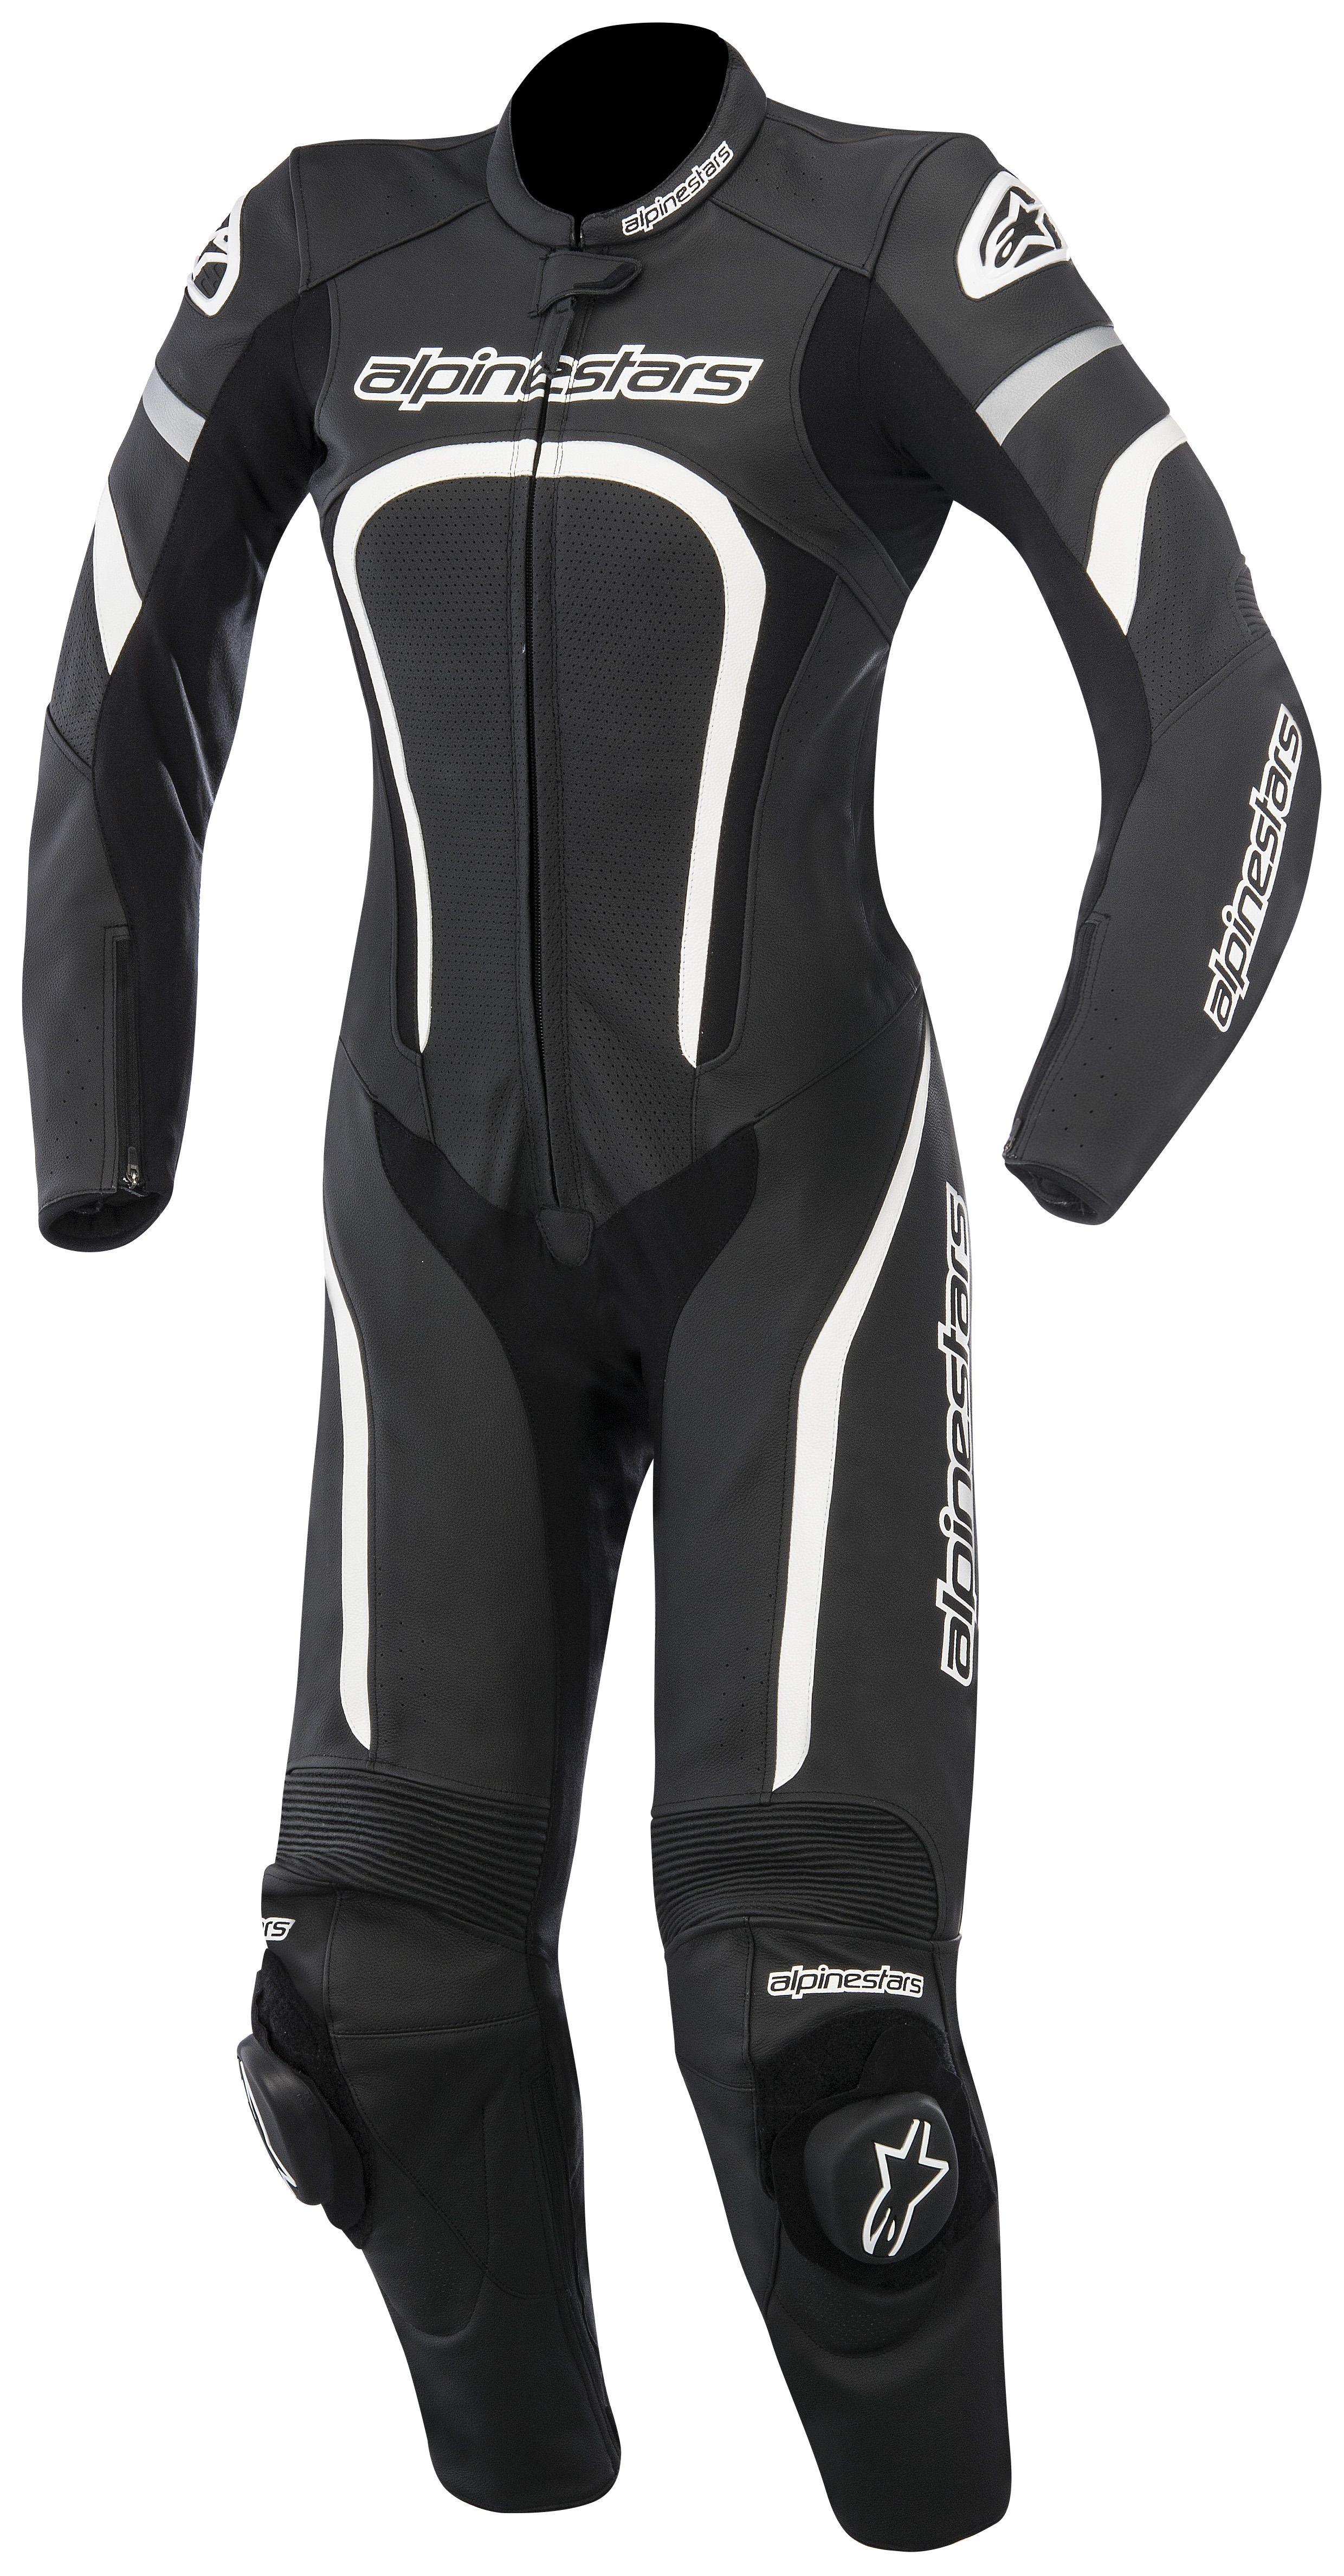 alpinestars stella motegi race suit revzilla. Black Bedroom Furniture Sets. Home Design Ideas